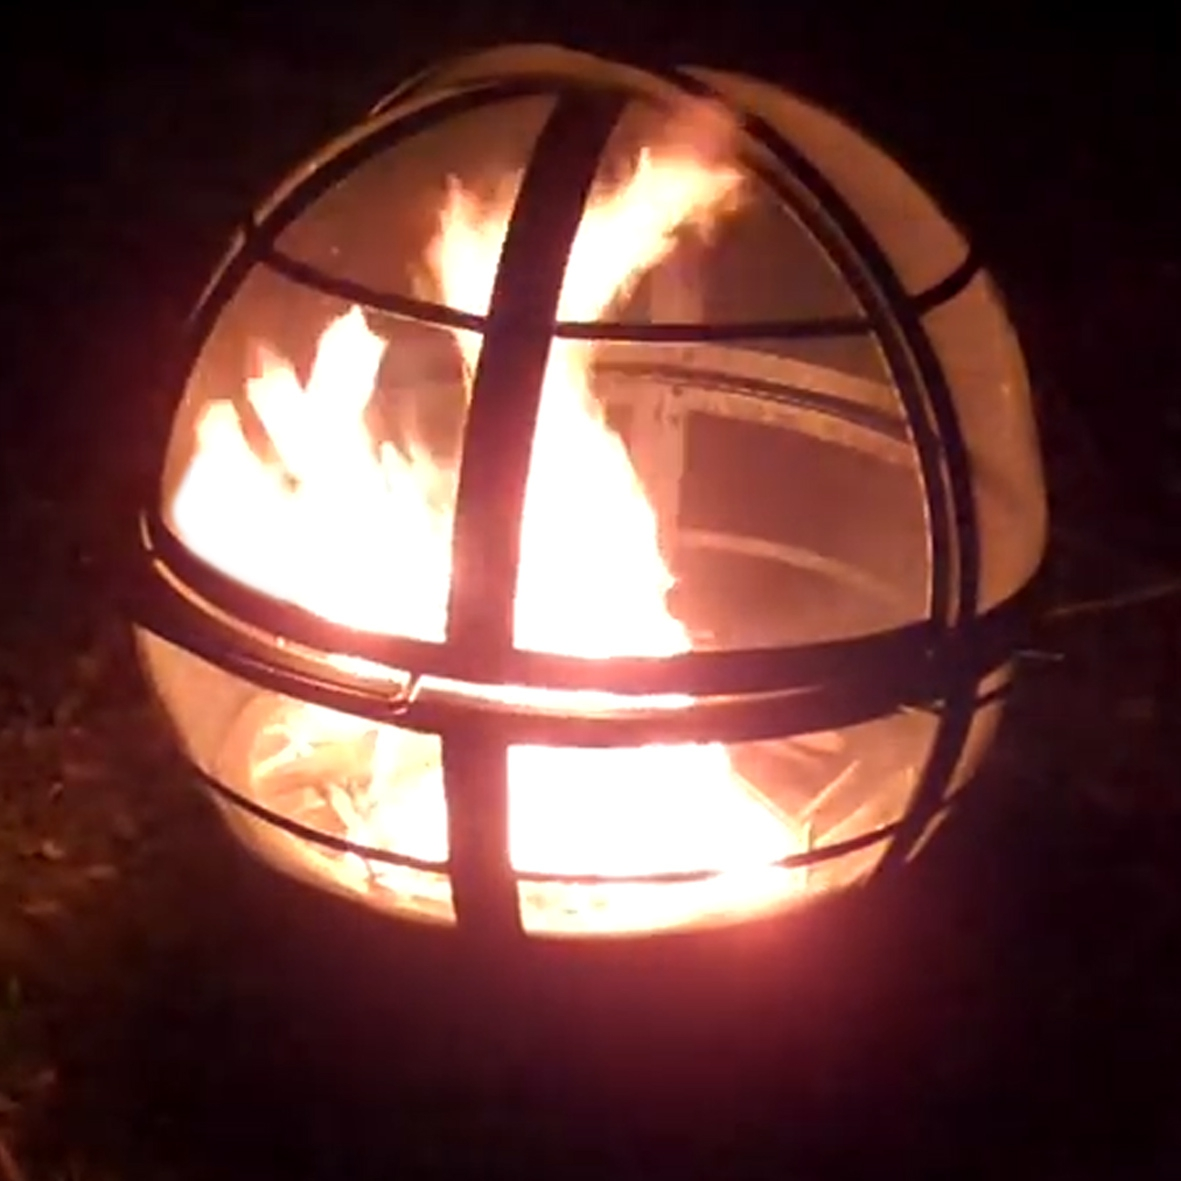 landmann ball o fire eldstad